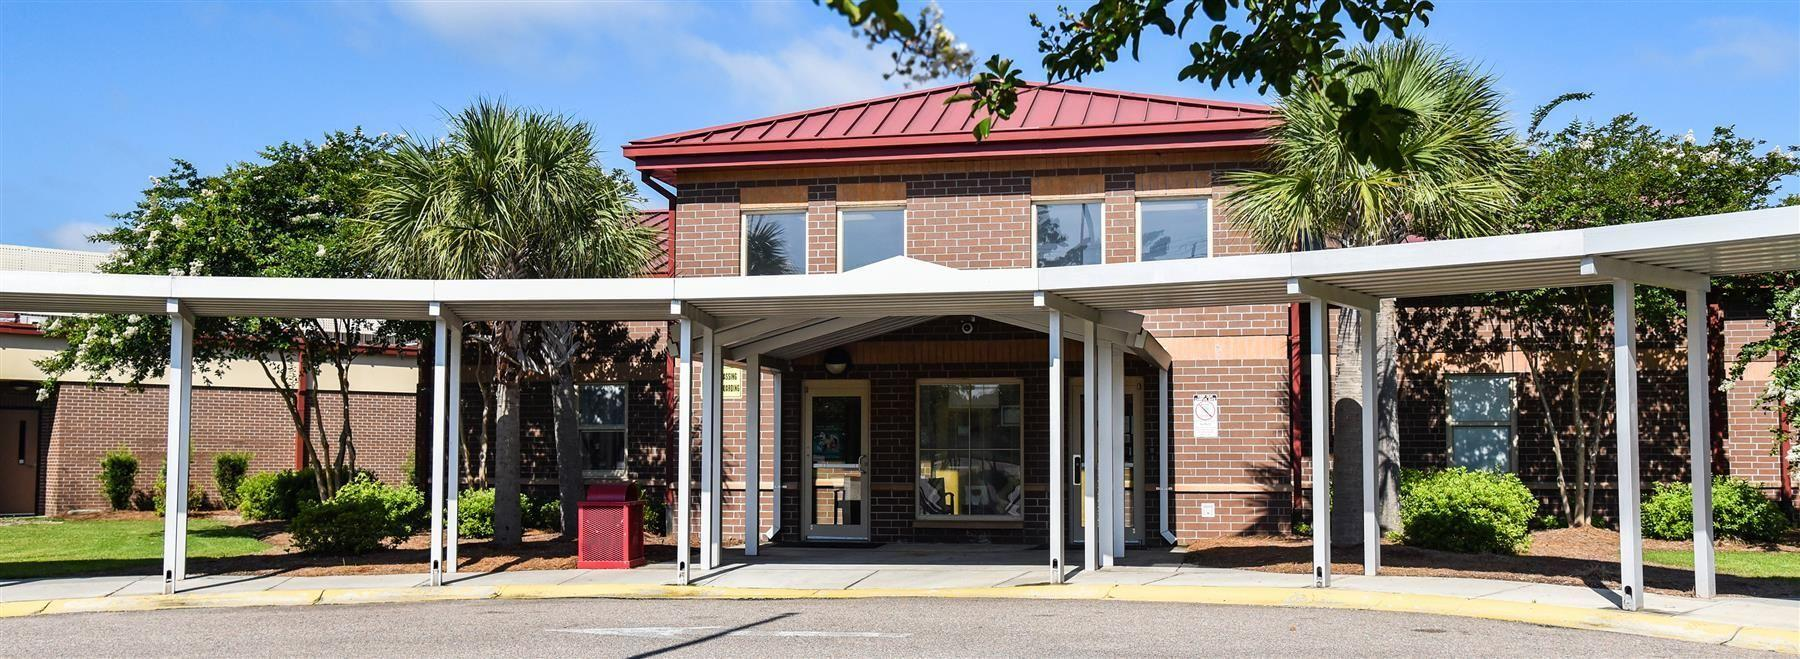 108 Sweet Cherry Lane Summerville, SC 29486